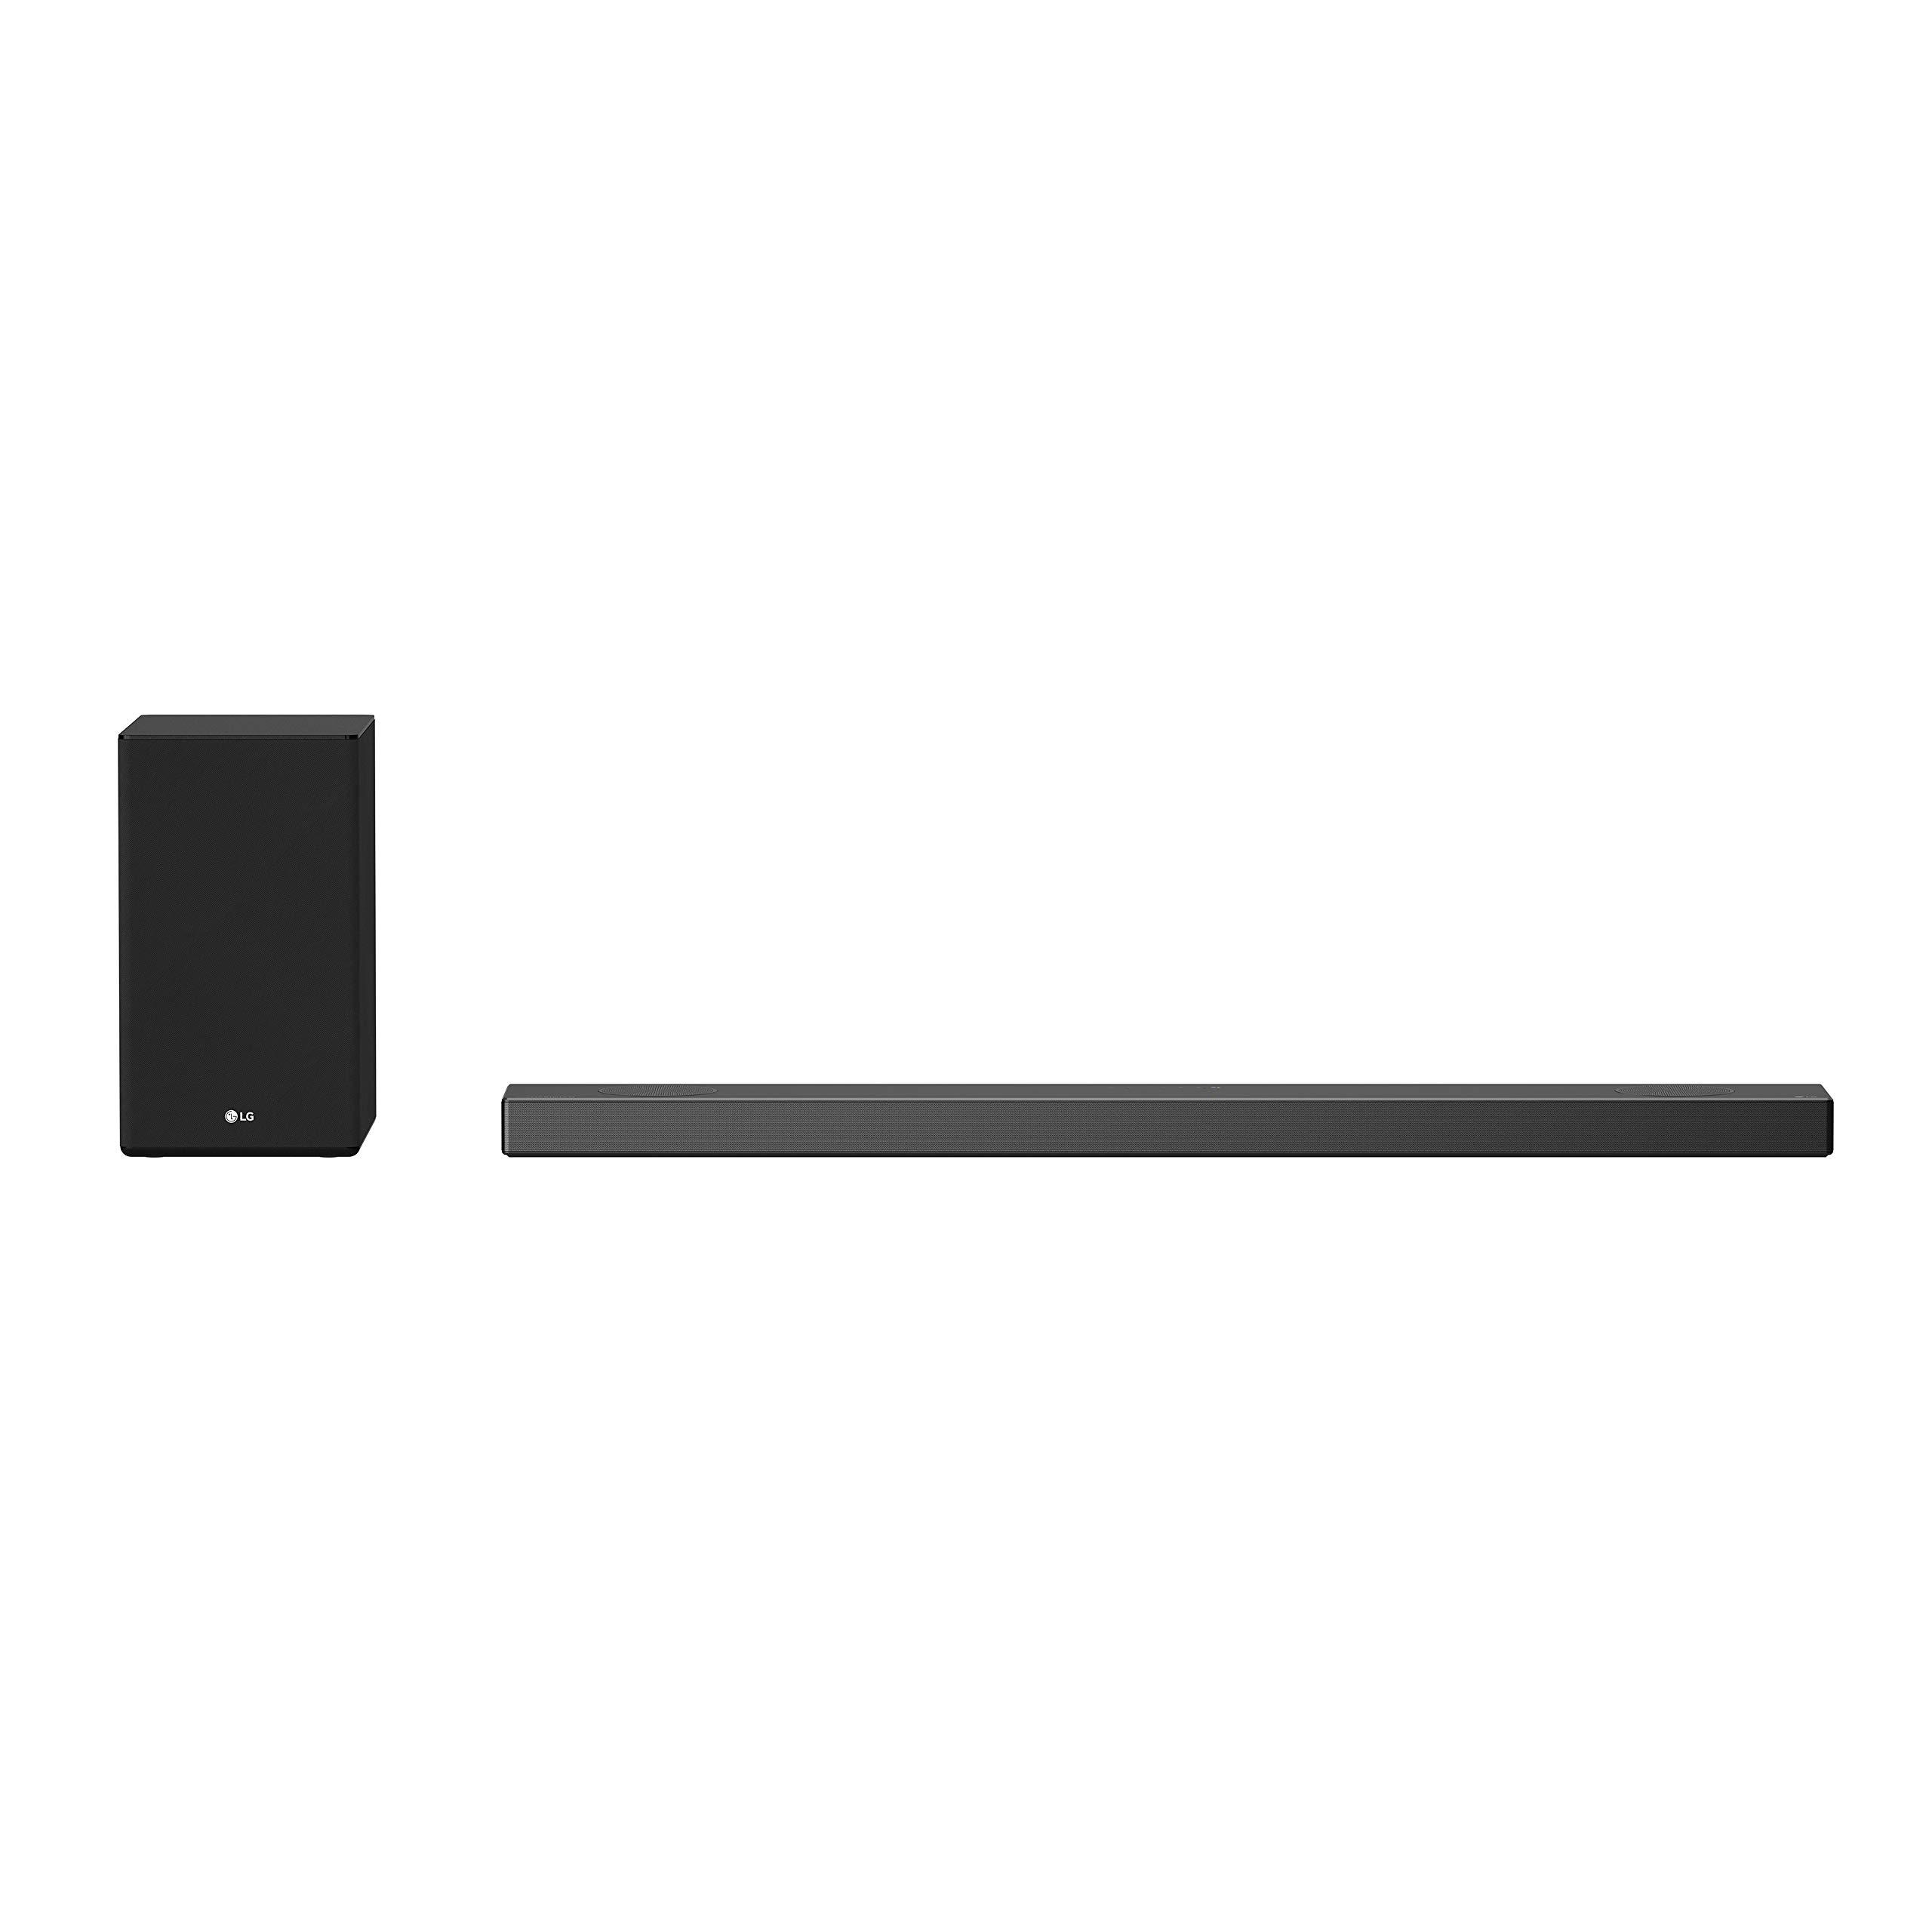 LG SN8YG 3.1.2 Dolby Atmos Soundbar review